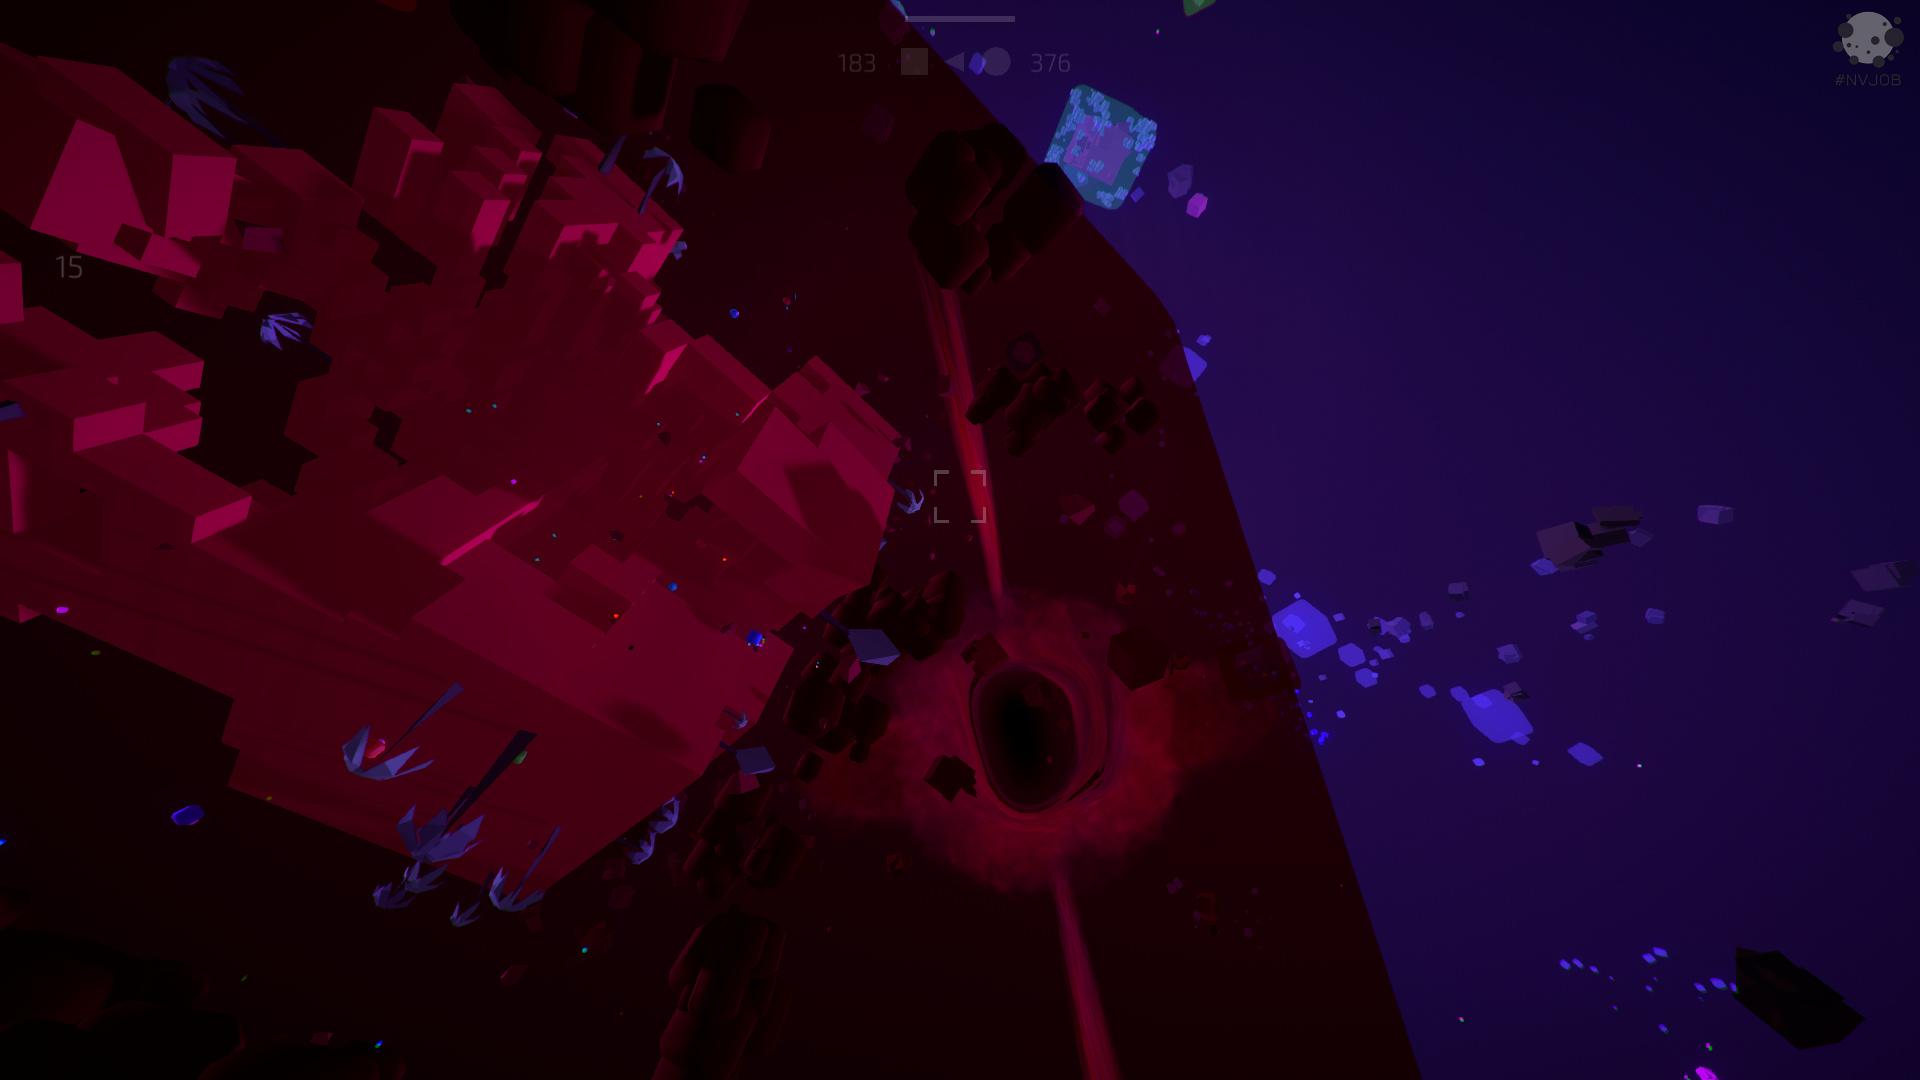 #NVJOB Nicholas Veselov (nvjob.github.io) | Infinity Square/Space Unity Asset